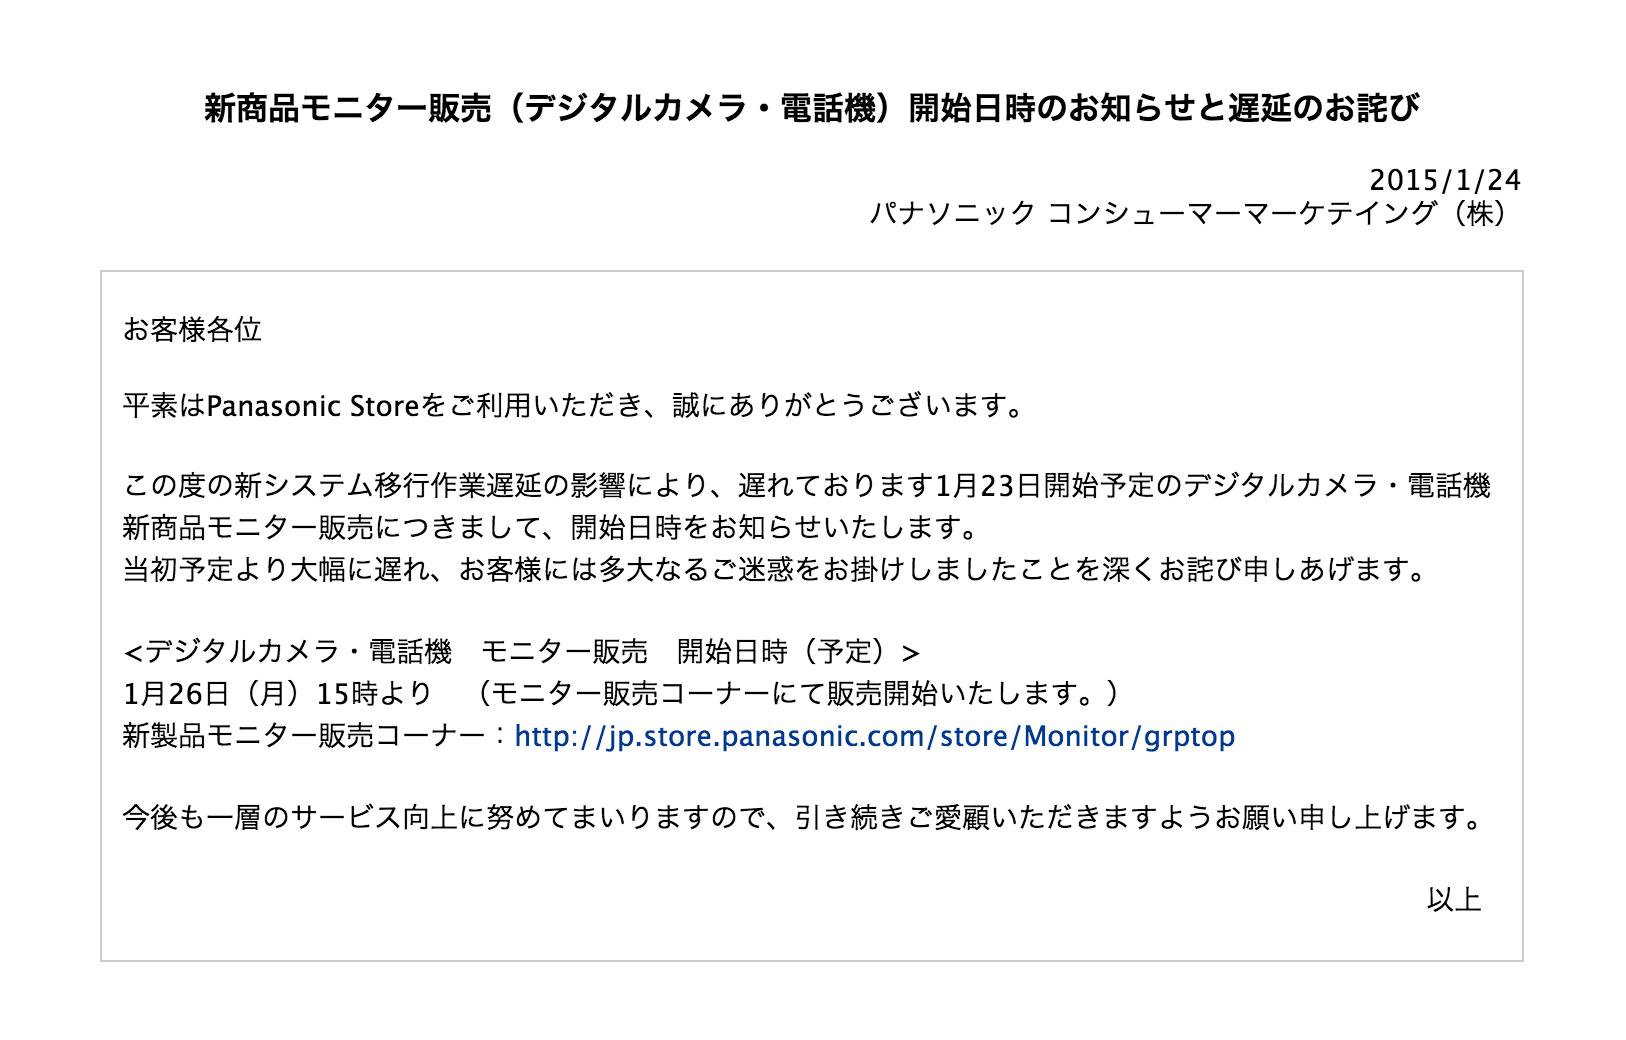 DMC-CM1 モニター発売延期